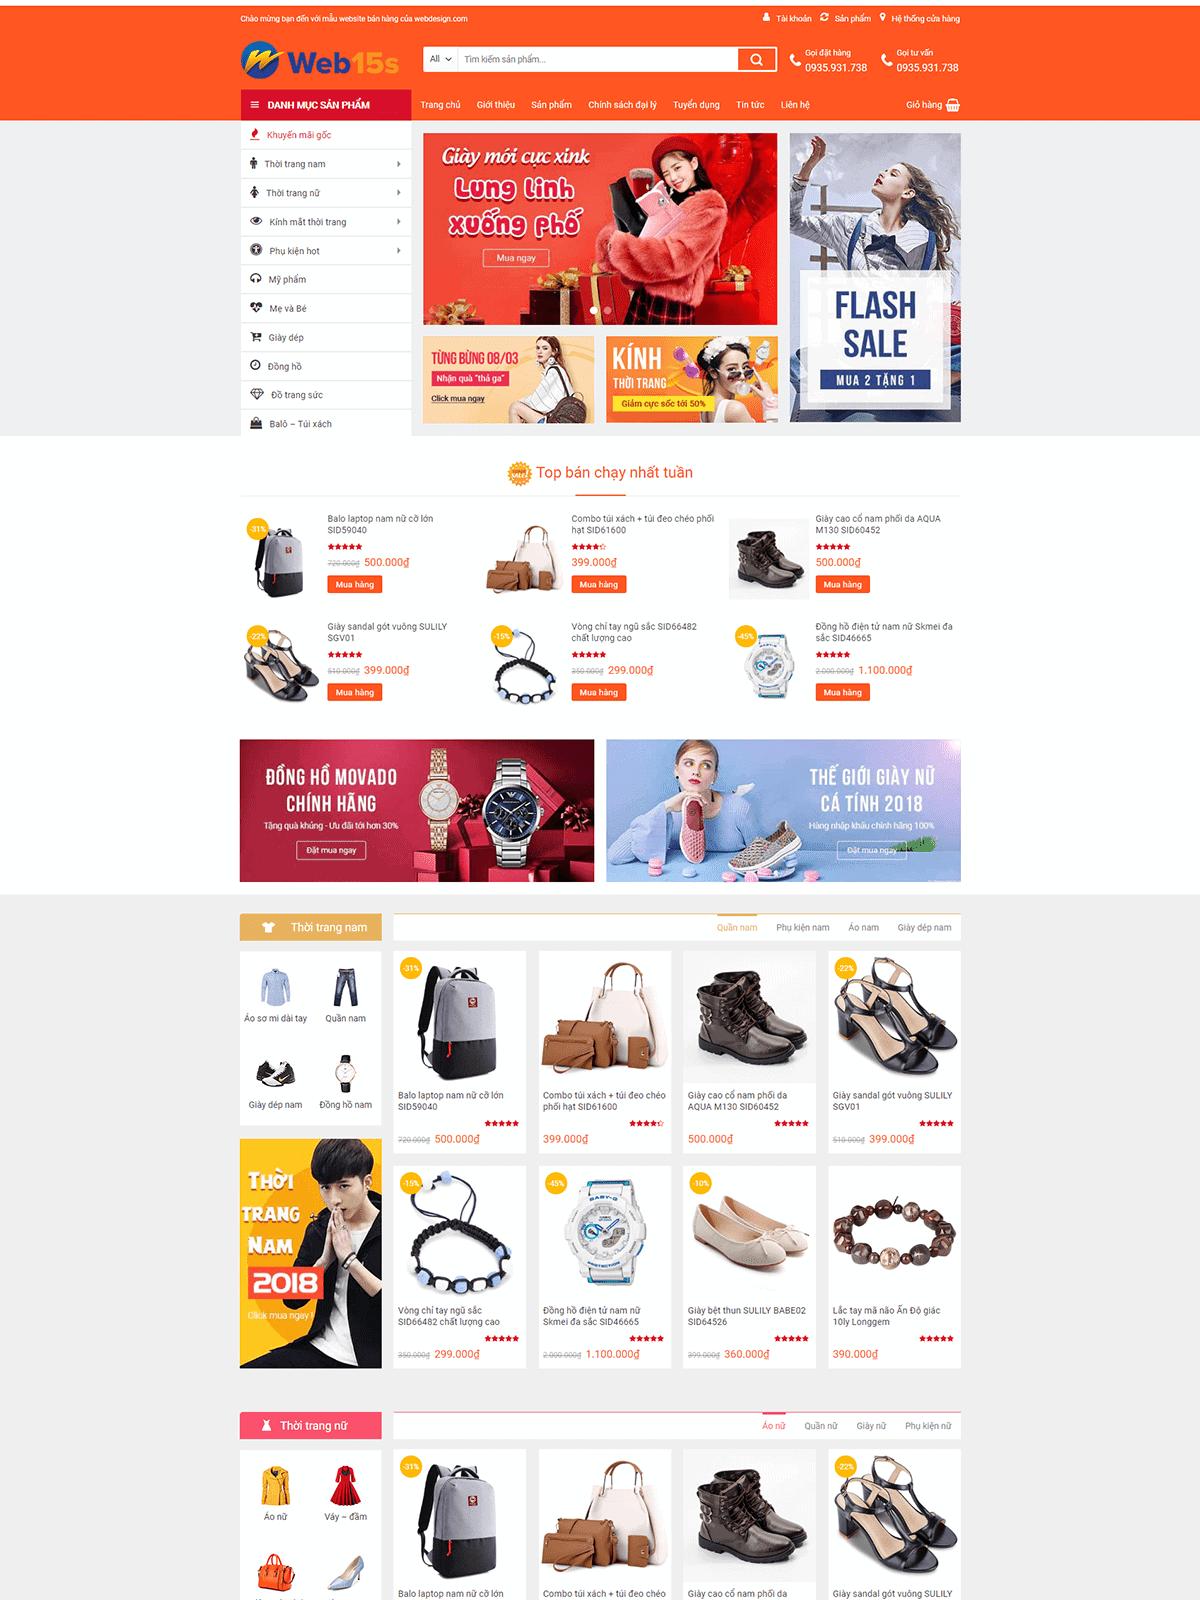 Mẫu Website Bán Thời Trang 1